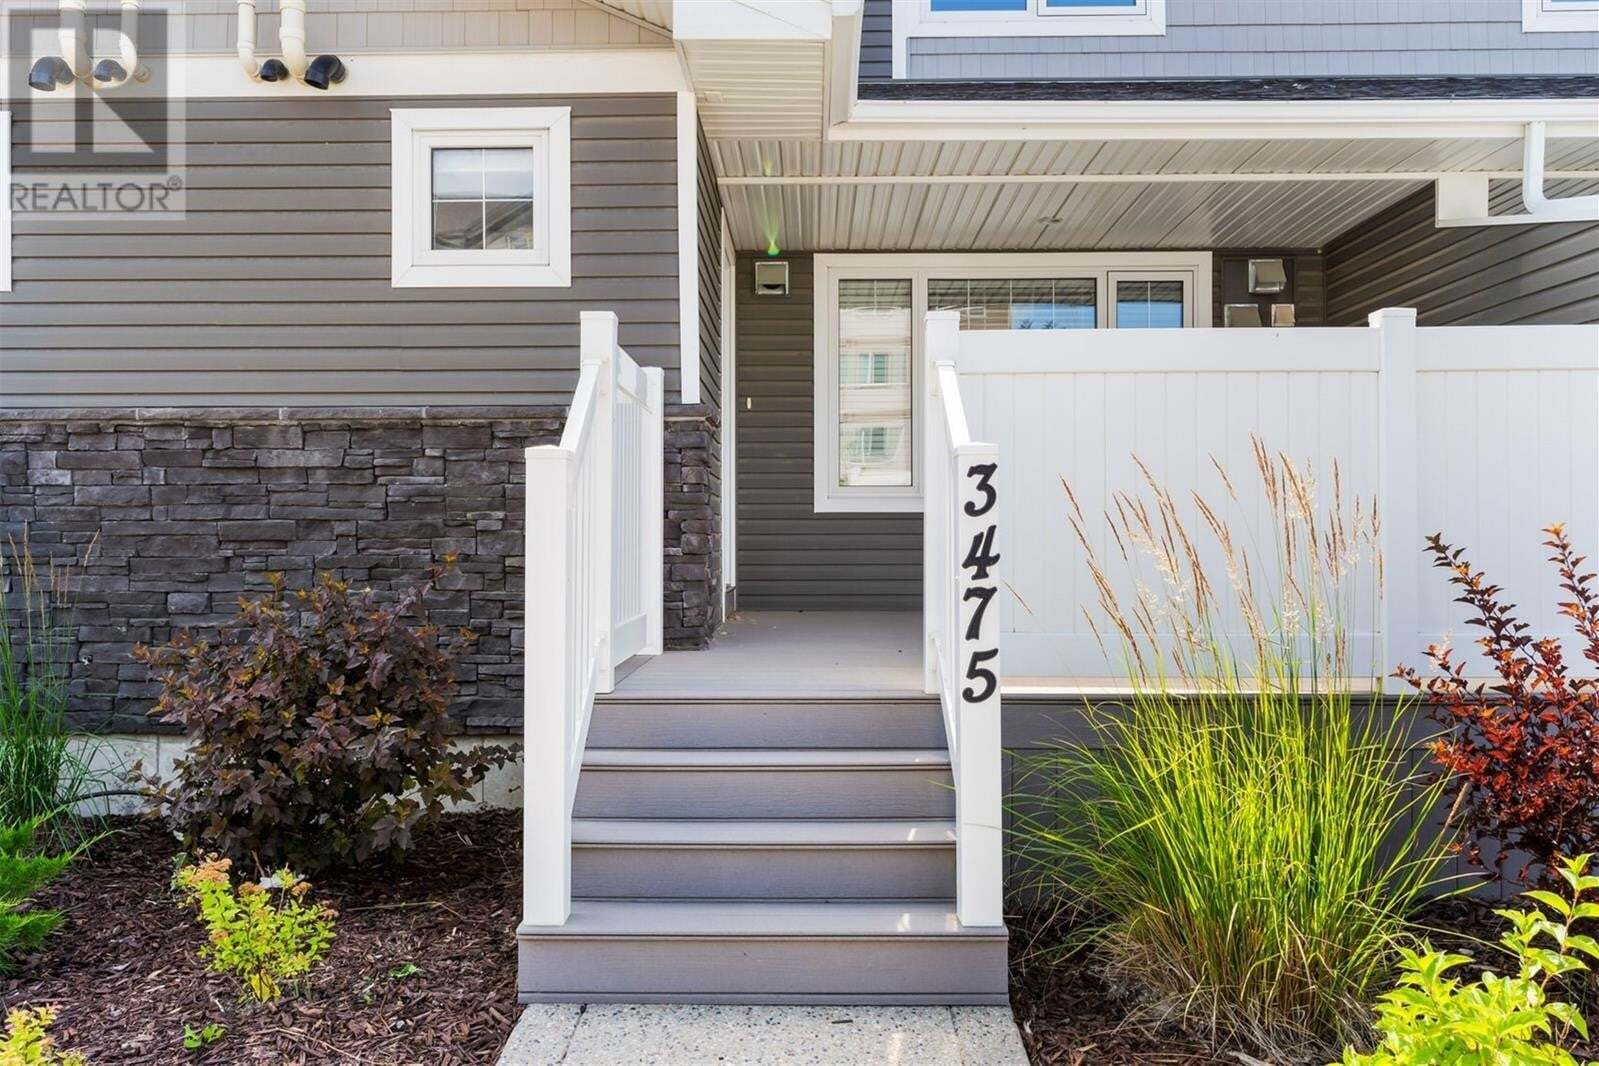 Townhouse for sale at 3475 Elgaard Dr Regina Saskatchewan - MLS: SK821526